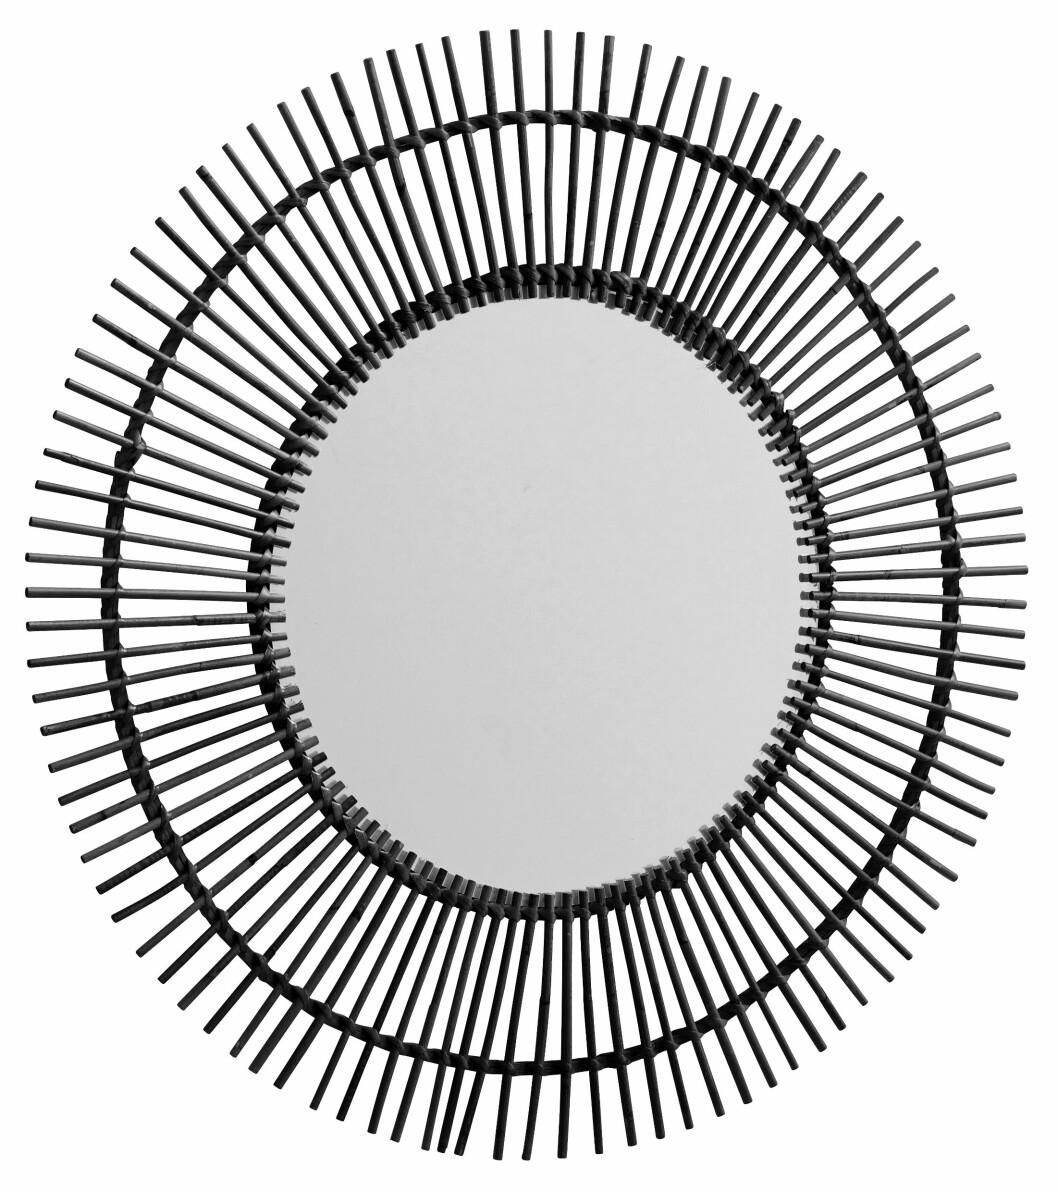 Speil med rattan-ramme (kr 1100, Nordal).